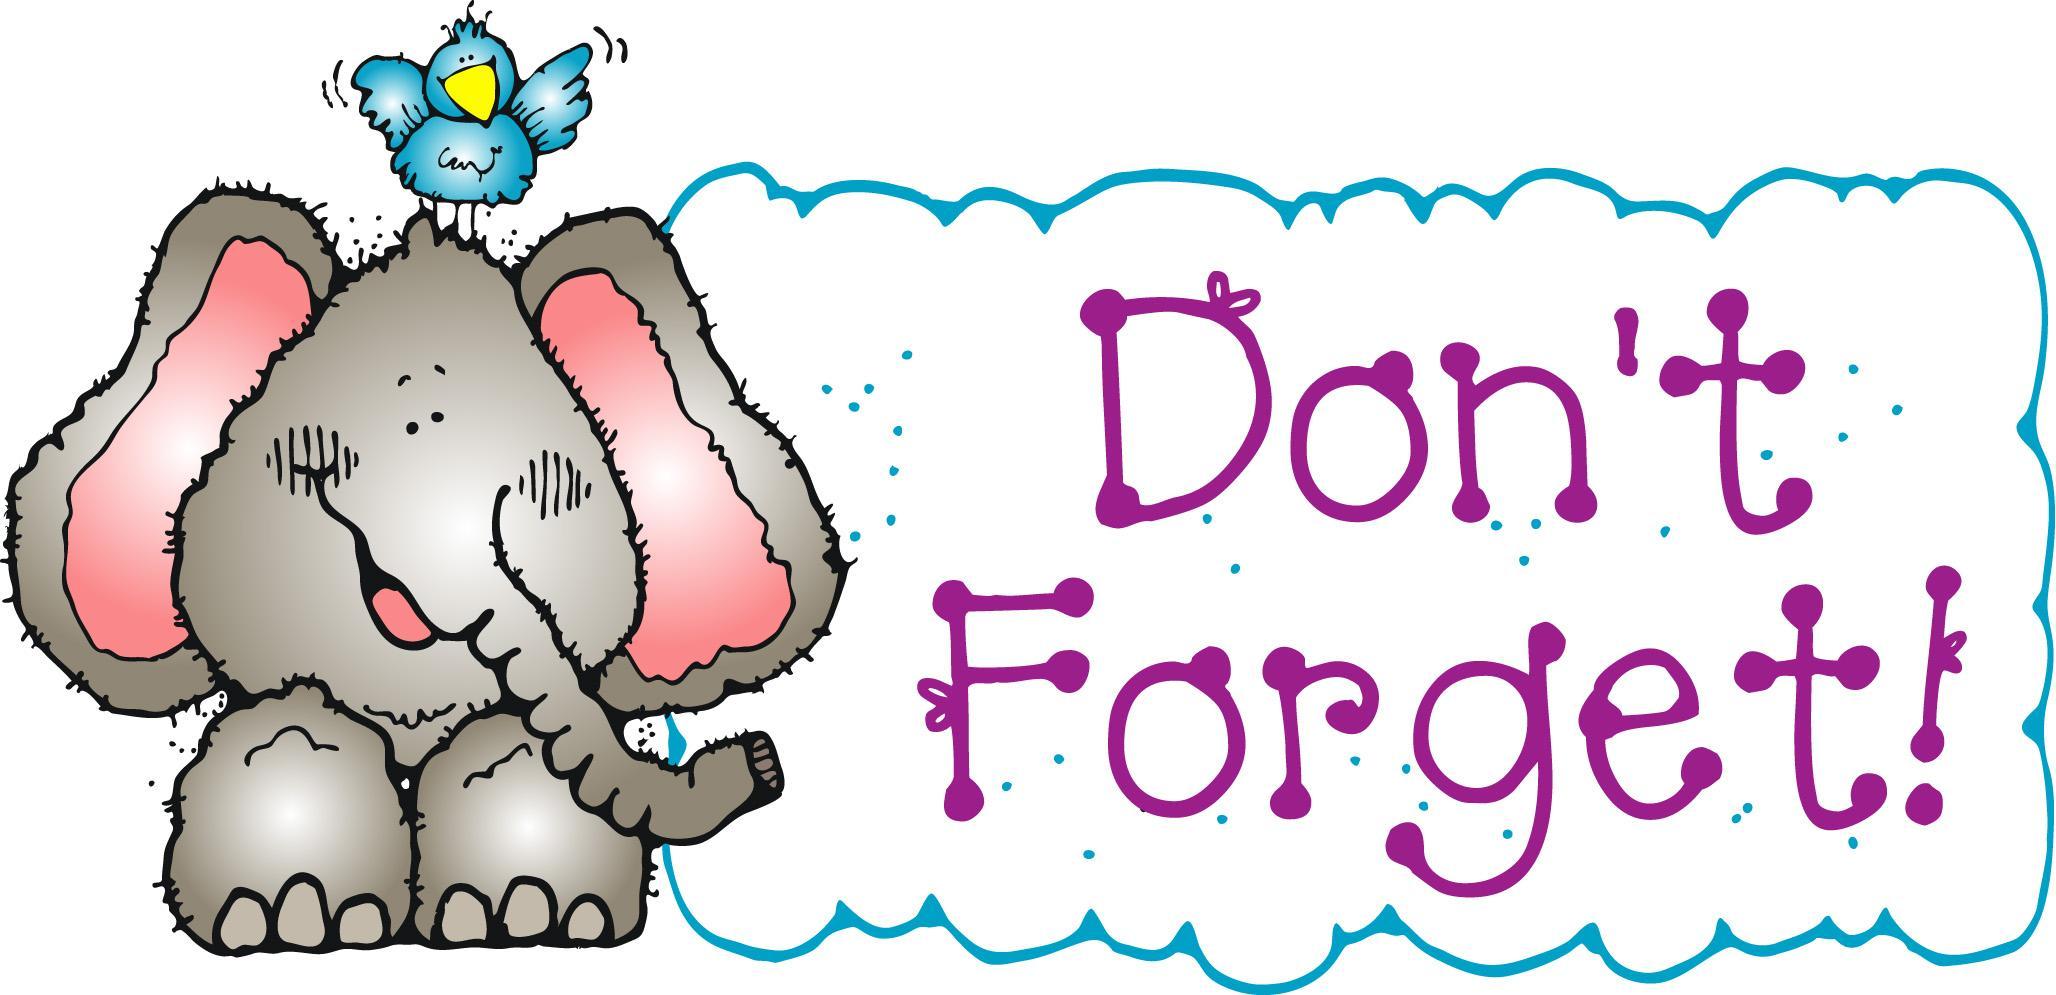 Clip art images free. Announcements clipart reminder